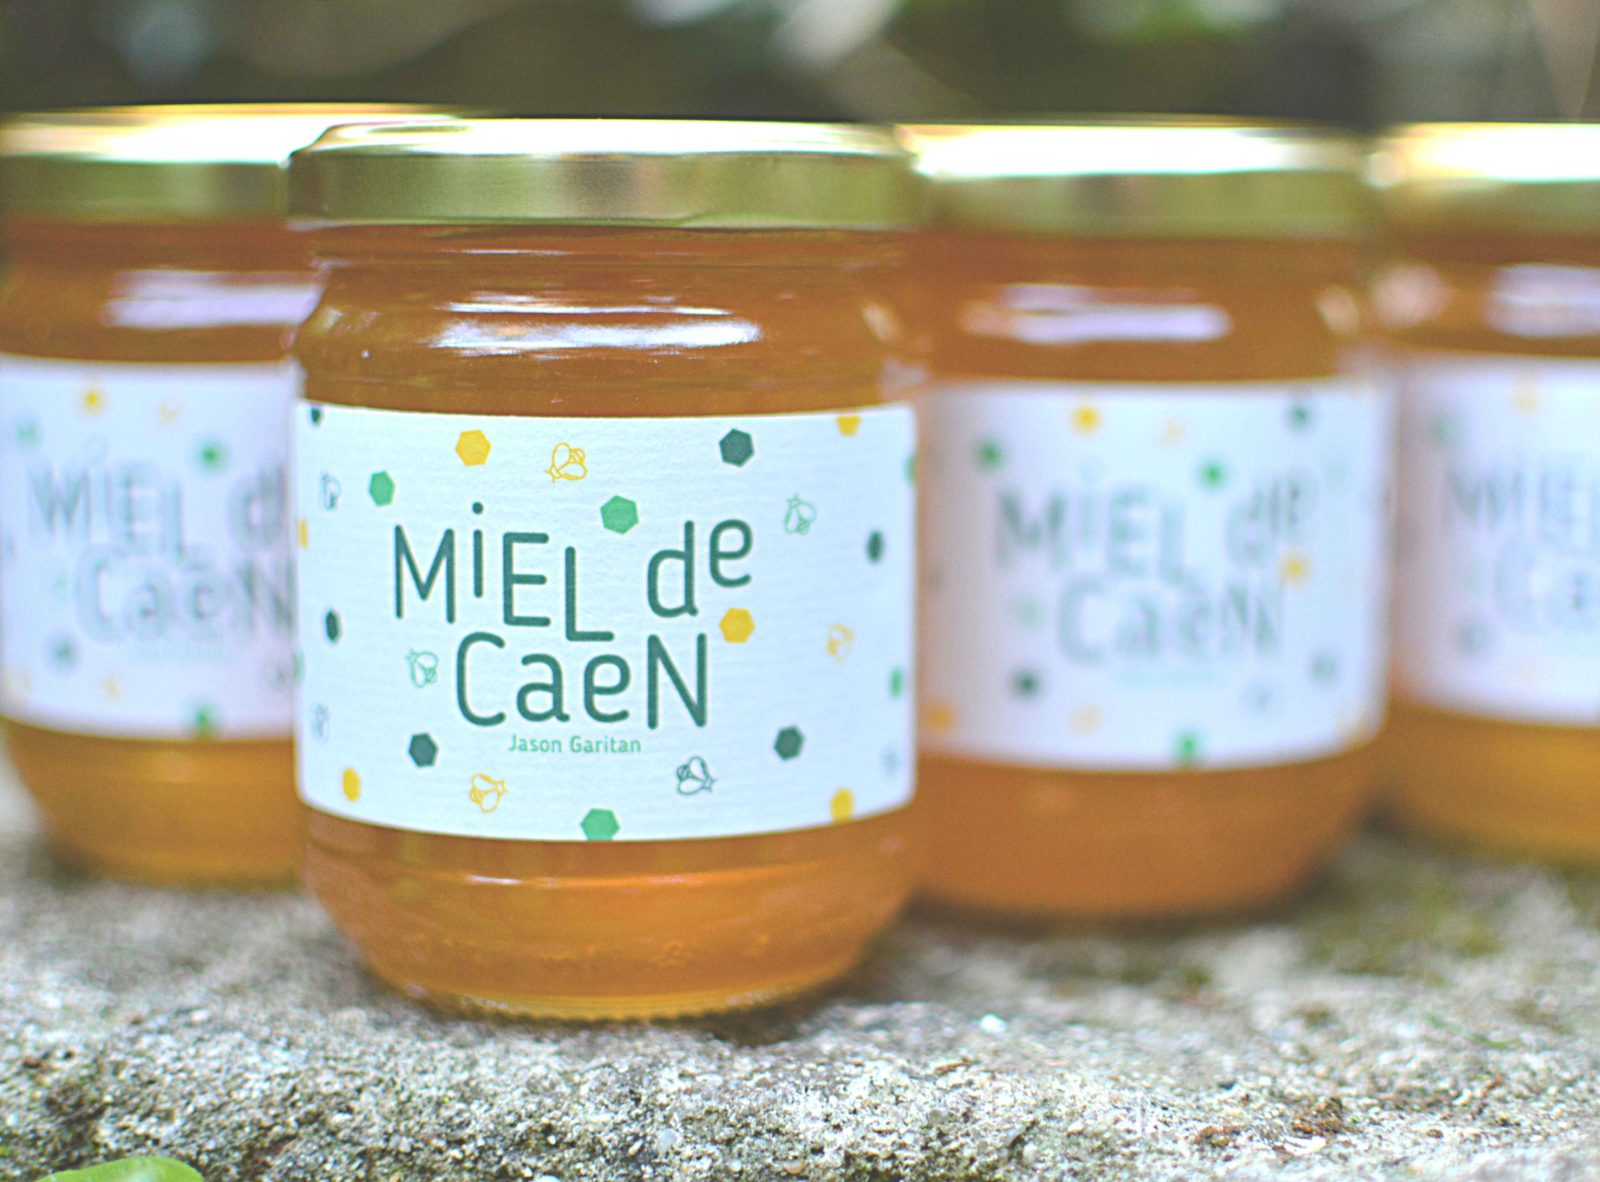 Miel de caen apiculteur Jason Garitan